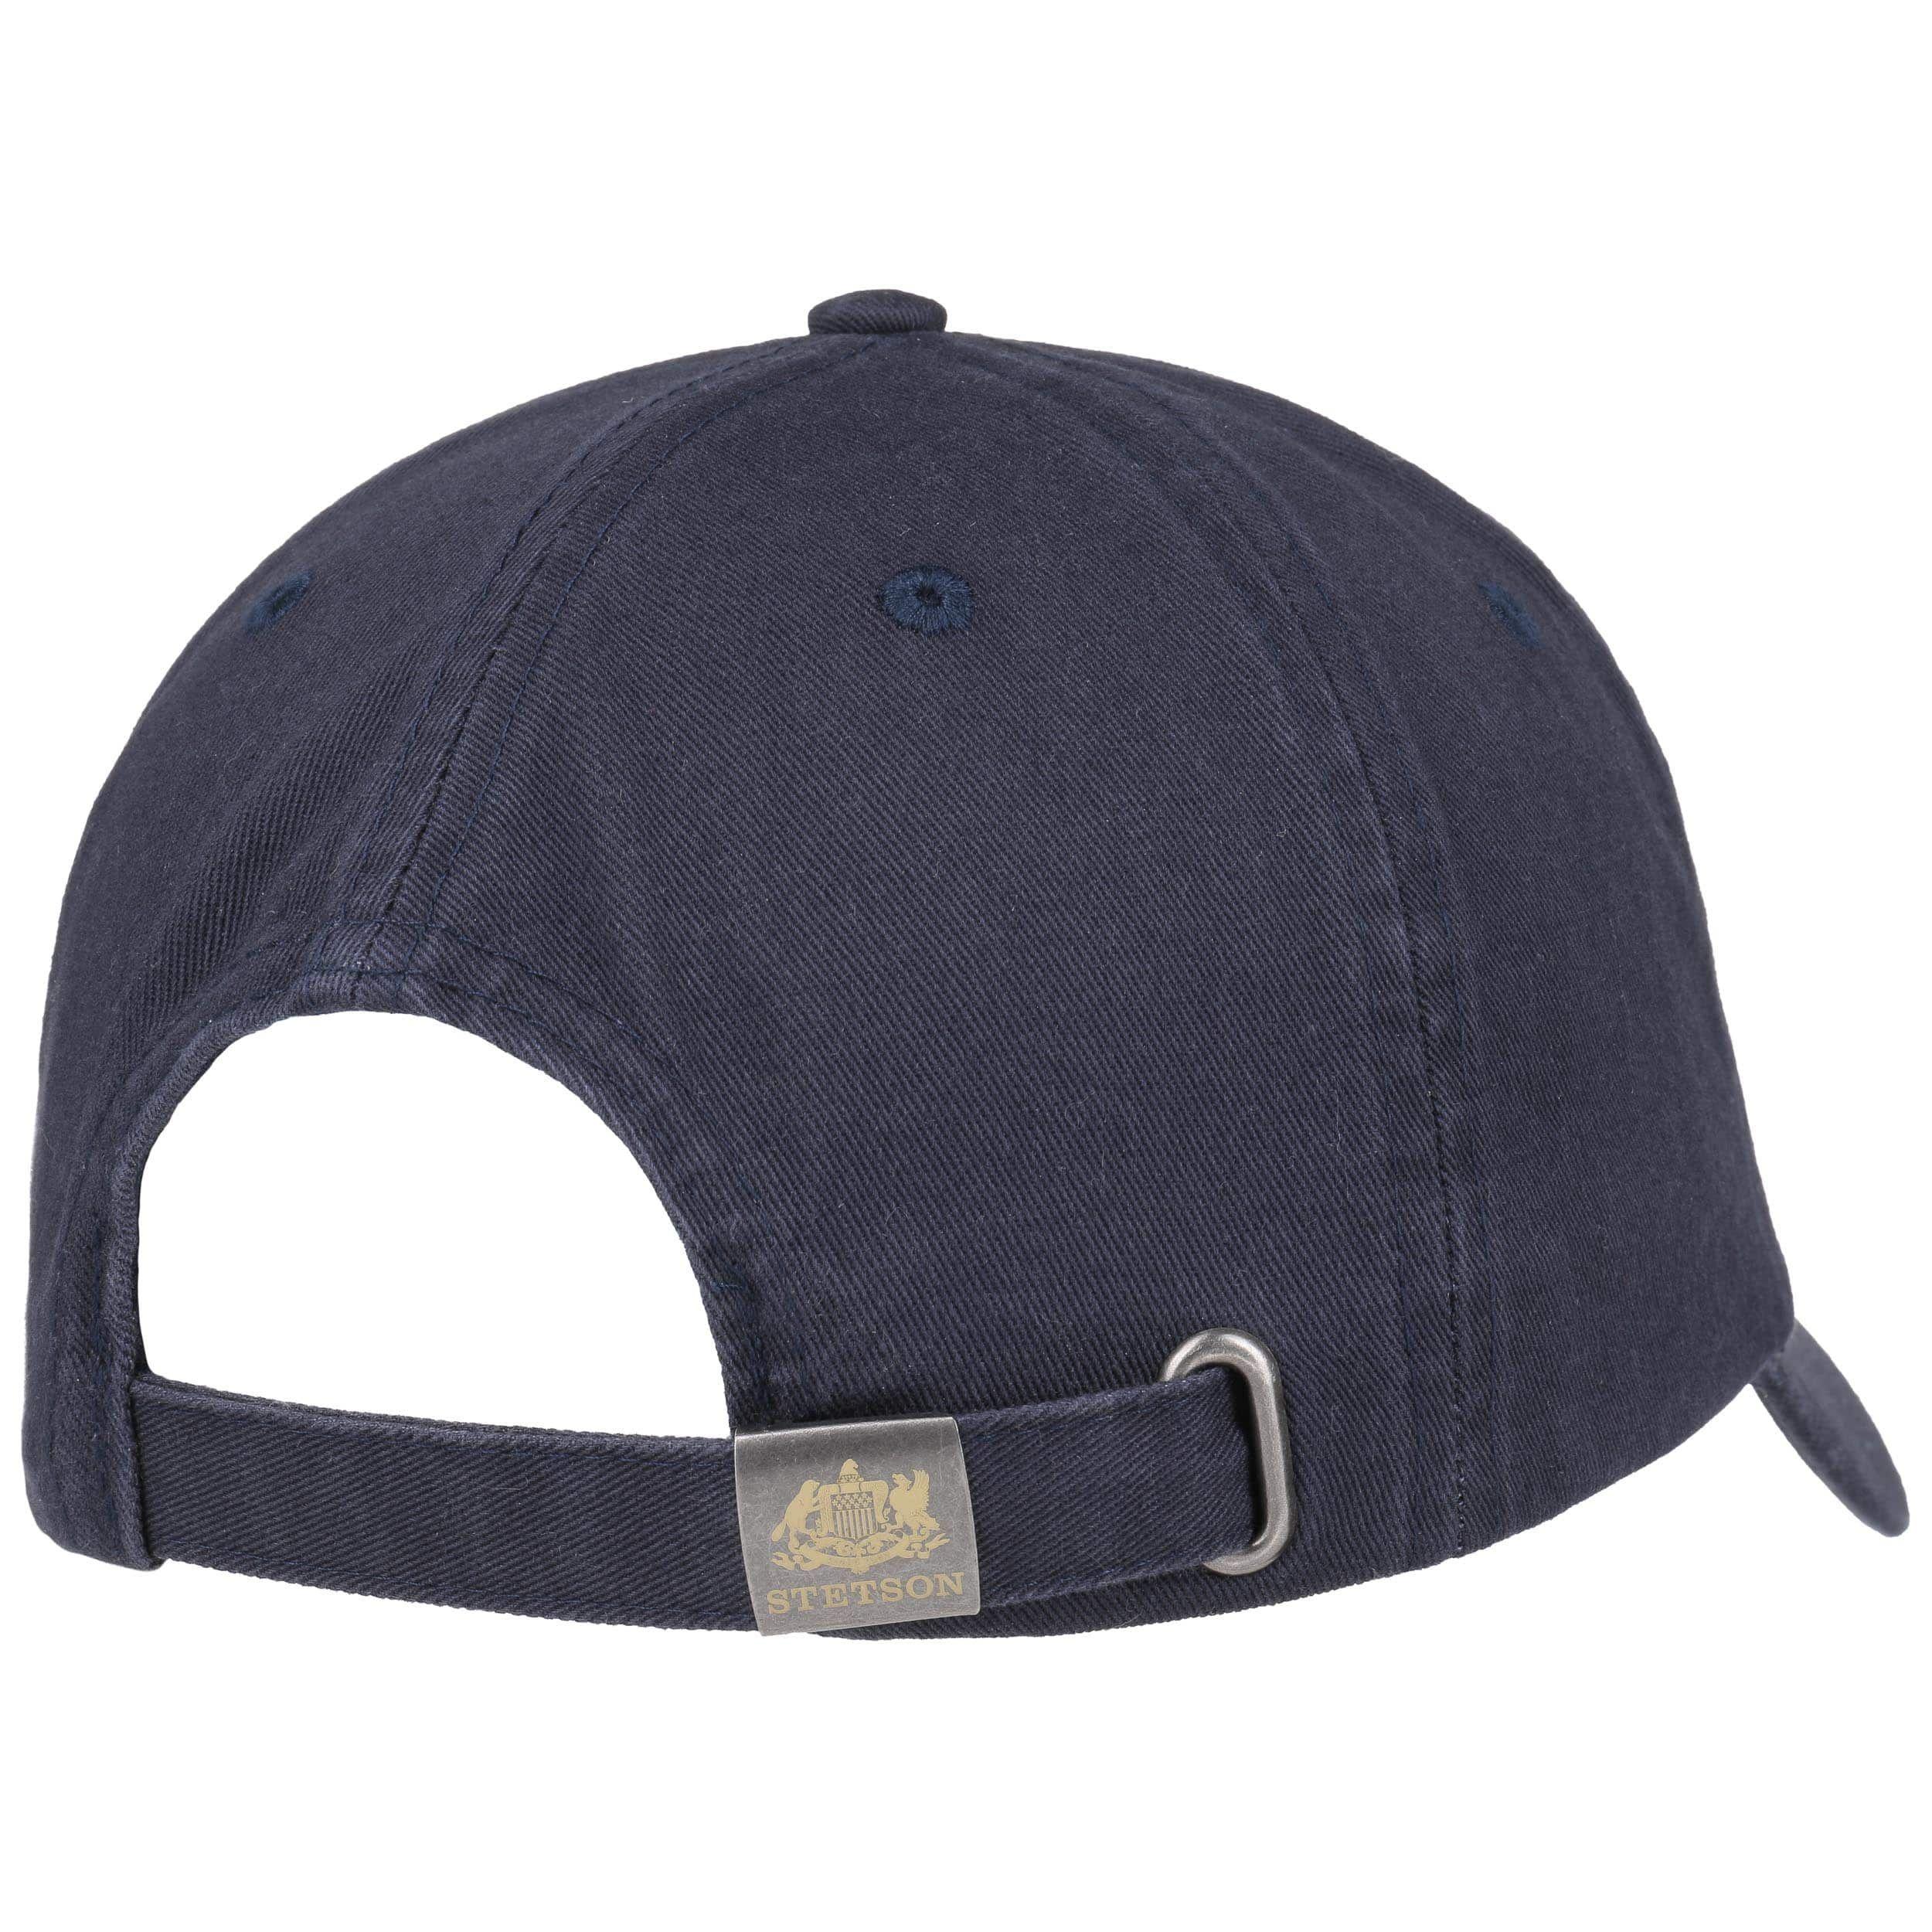 Rector Baseballcap donkerblauw